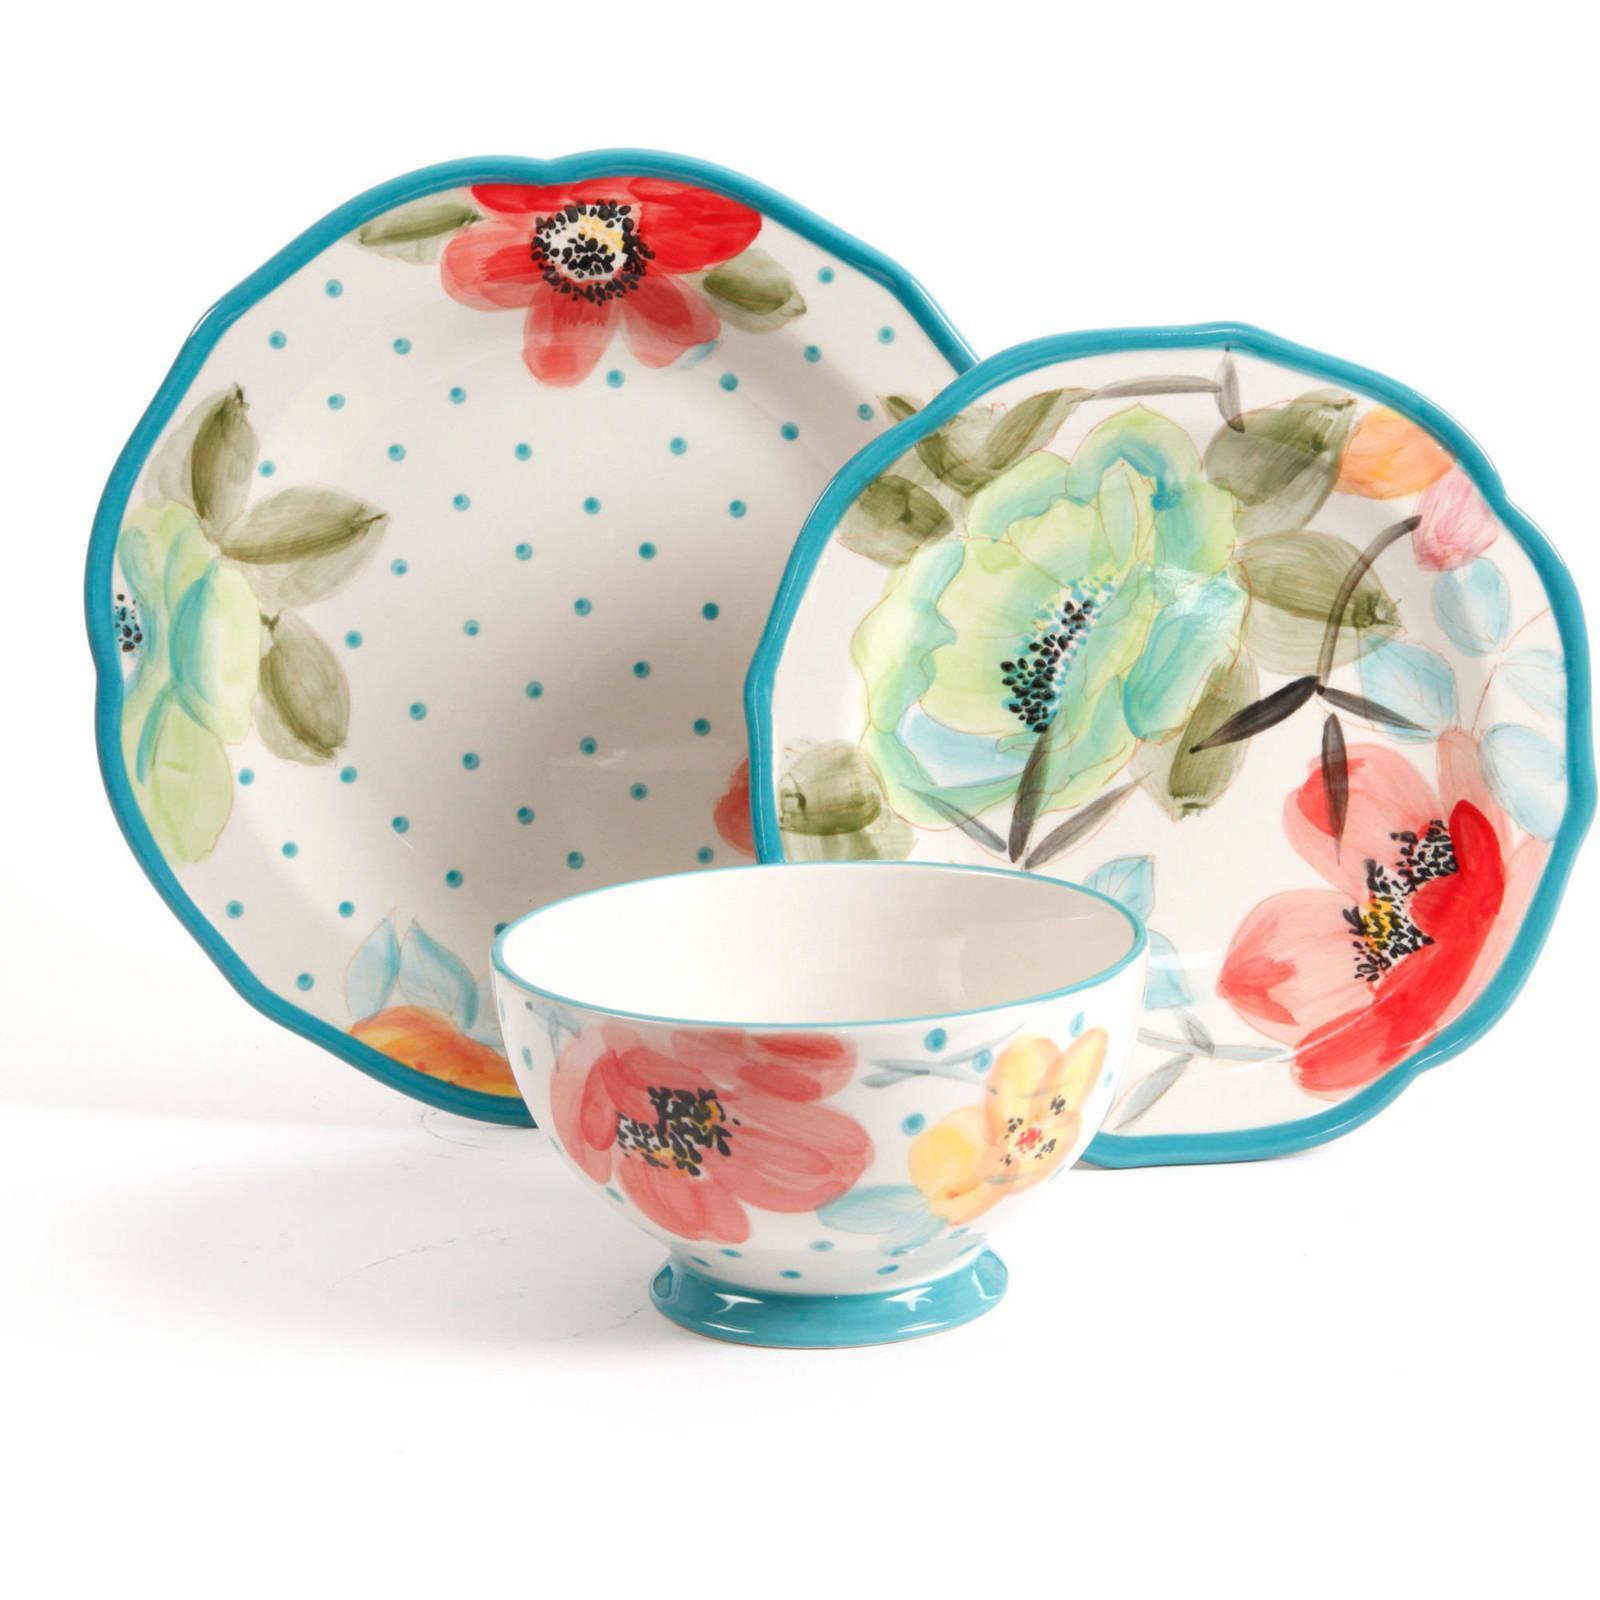 The Bloom 12-Piece Dinnerware Set